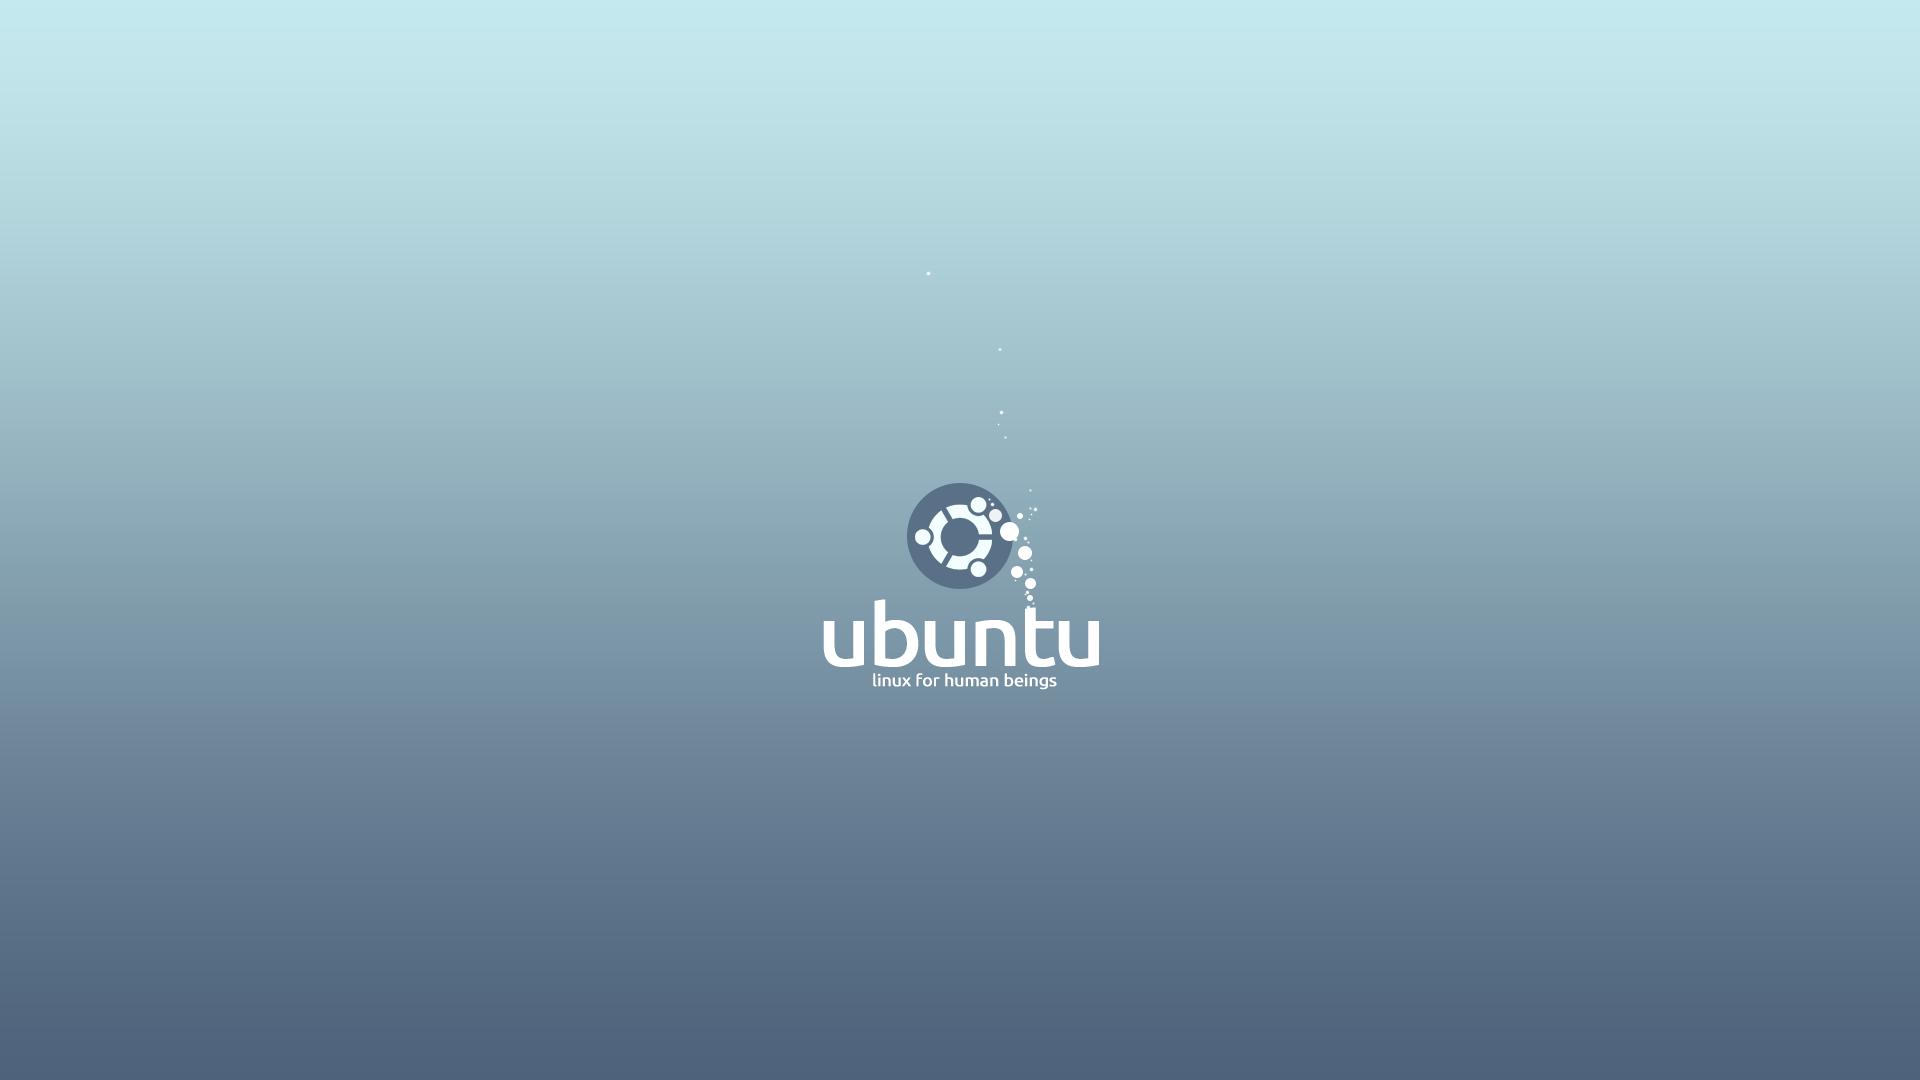 Ubuntu Wallpapers Hd wallpaper   627109 1920x1080